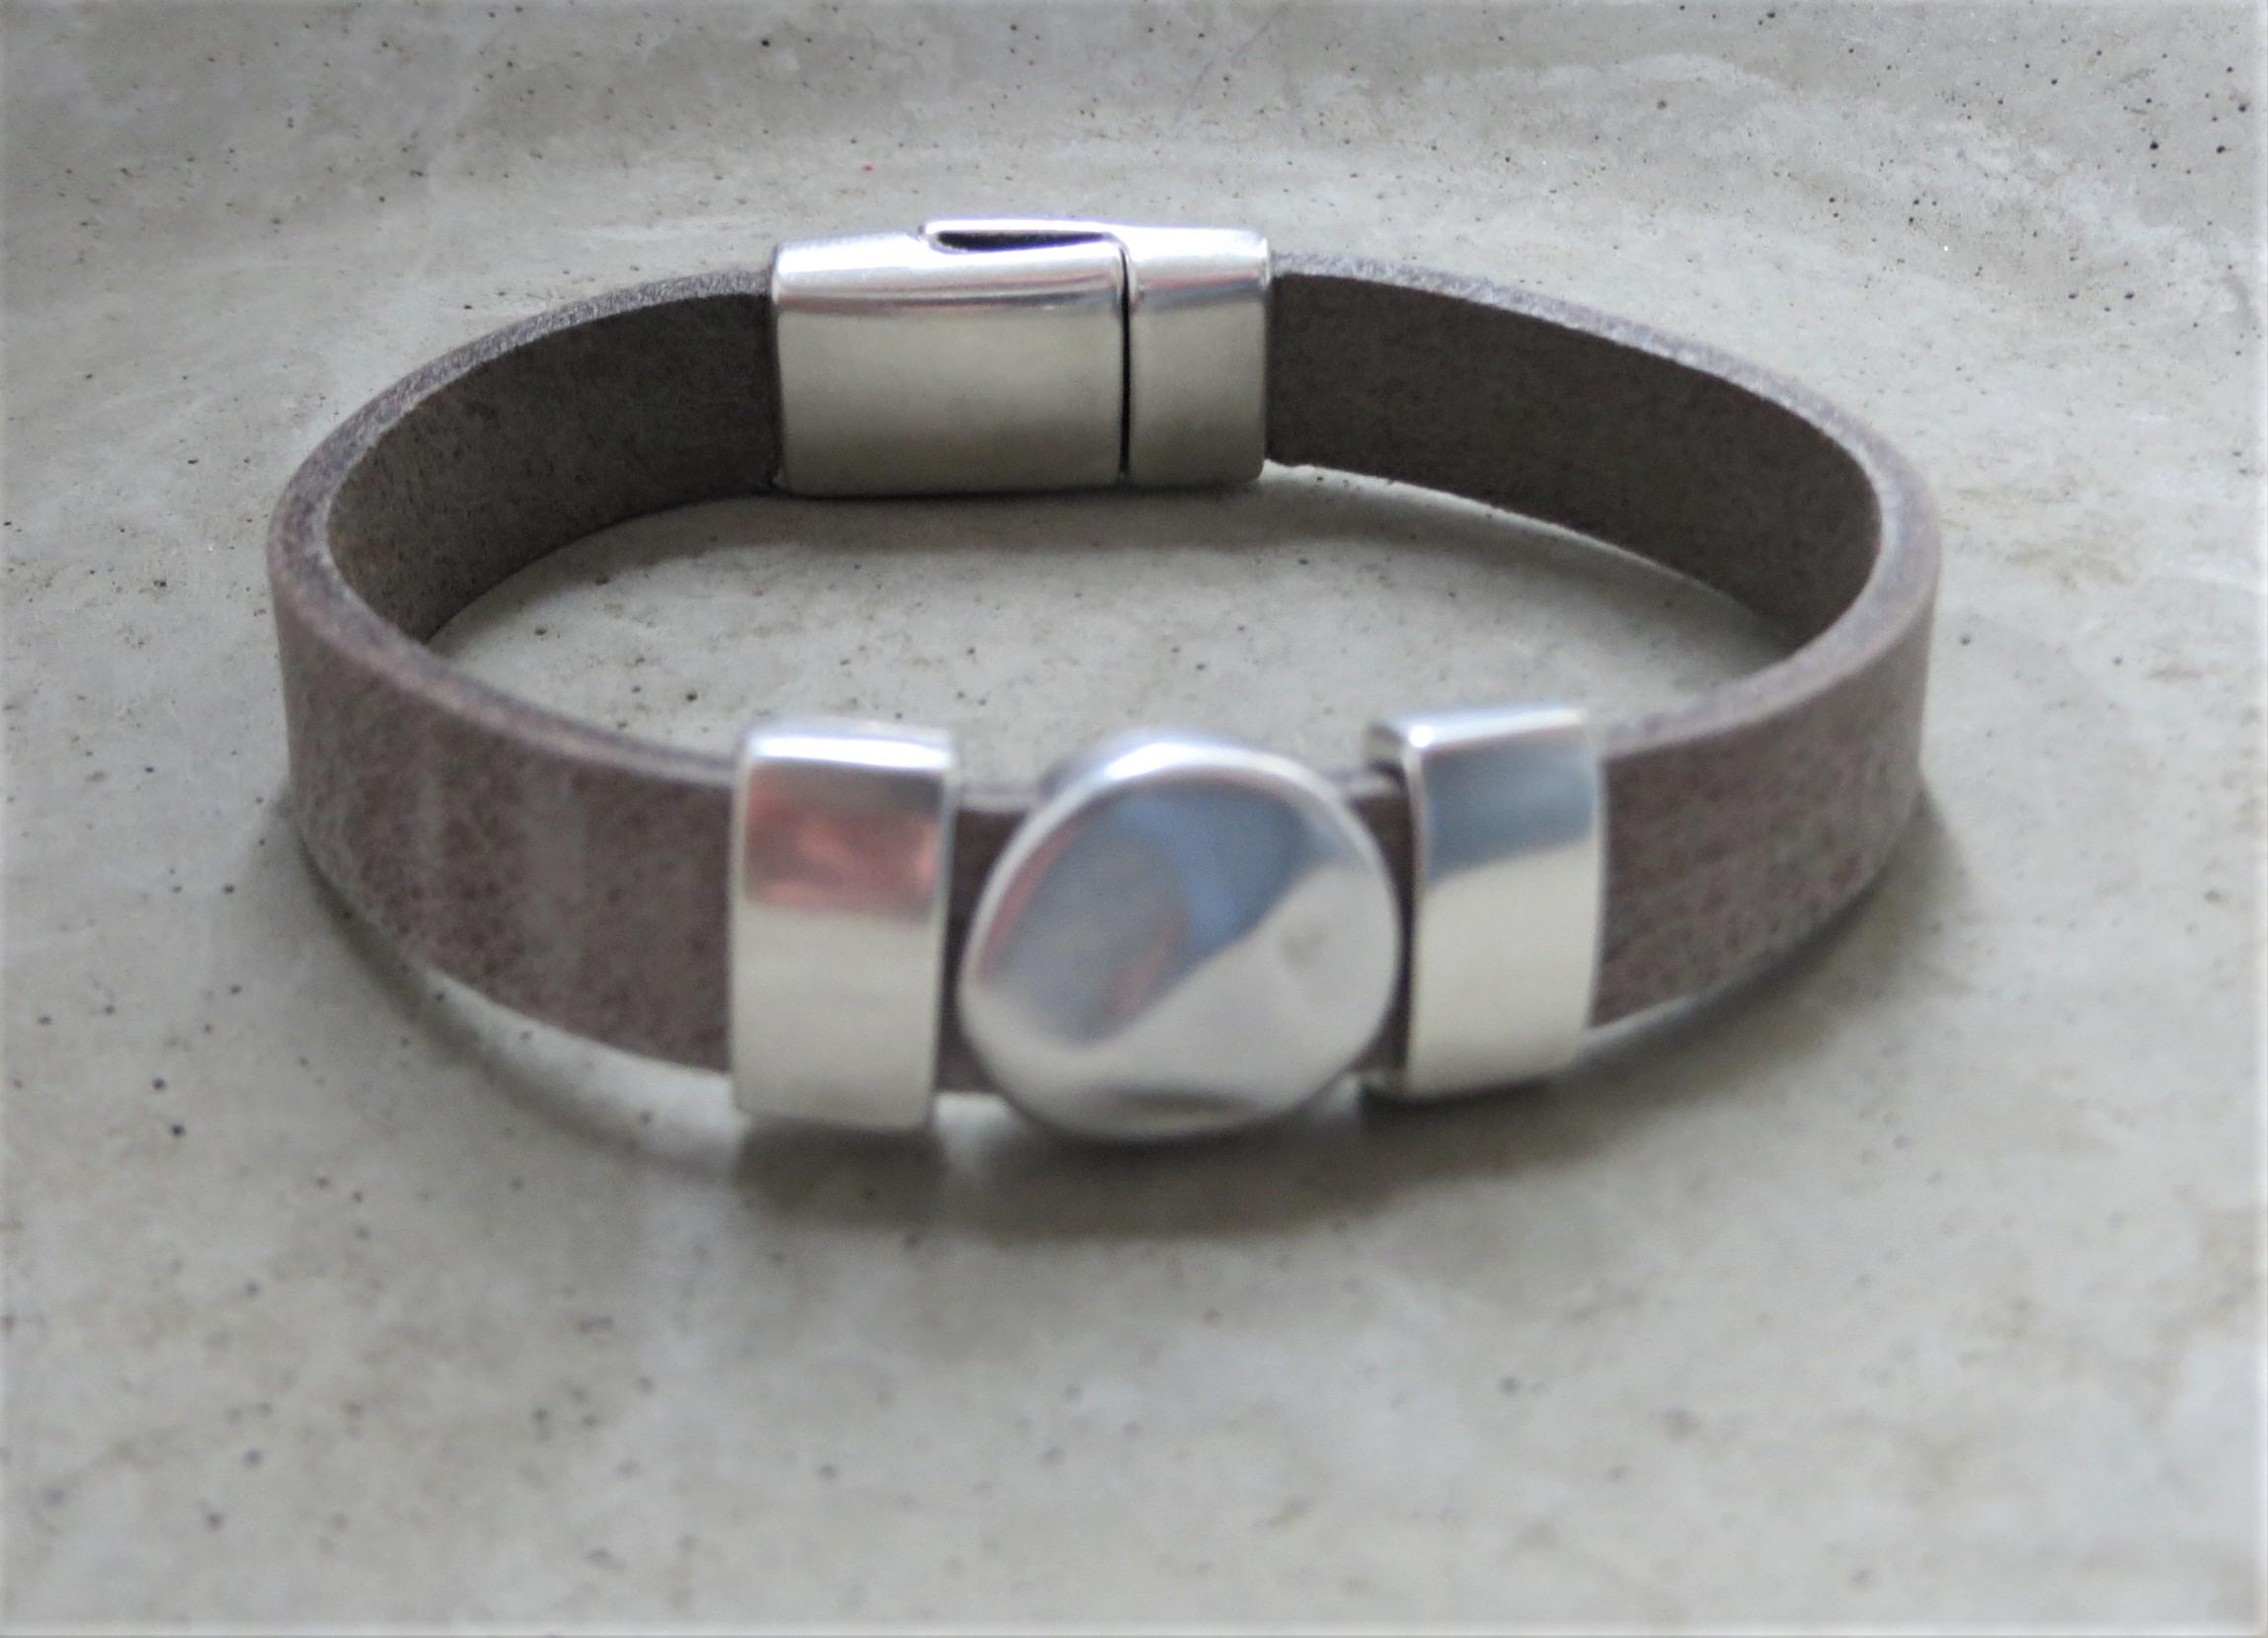 Armbaender - QOSS Armband KIM Grau Silber M  - Onlineshop Tante Emmer